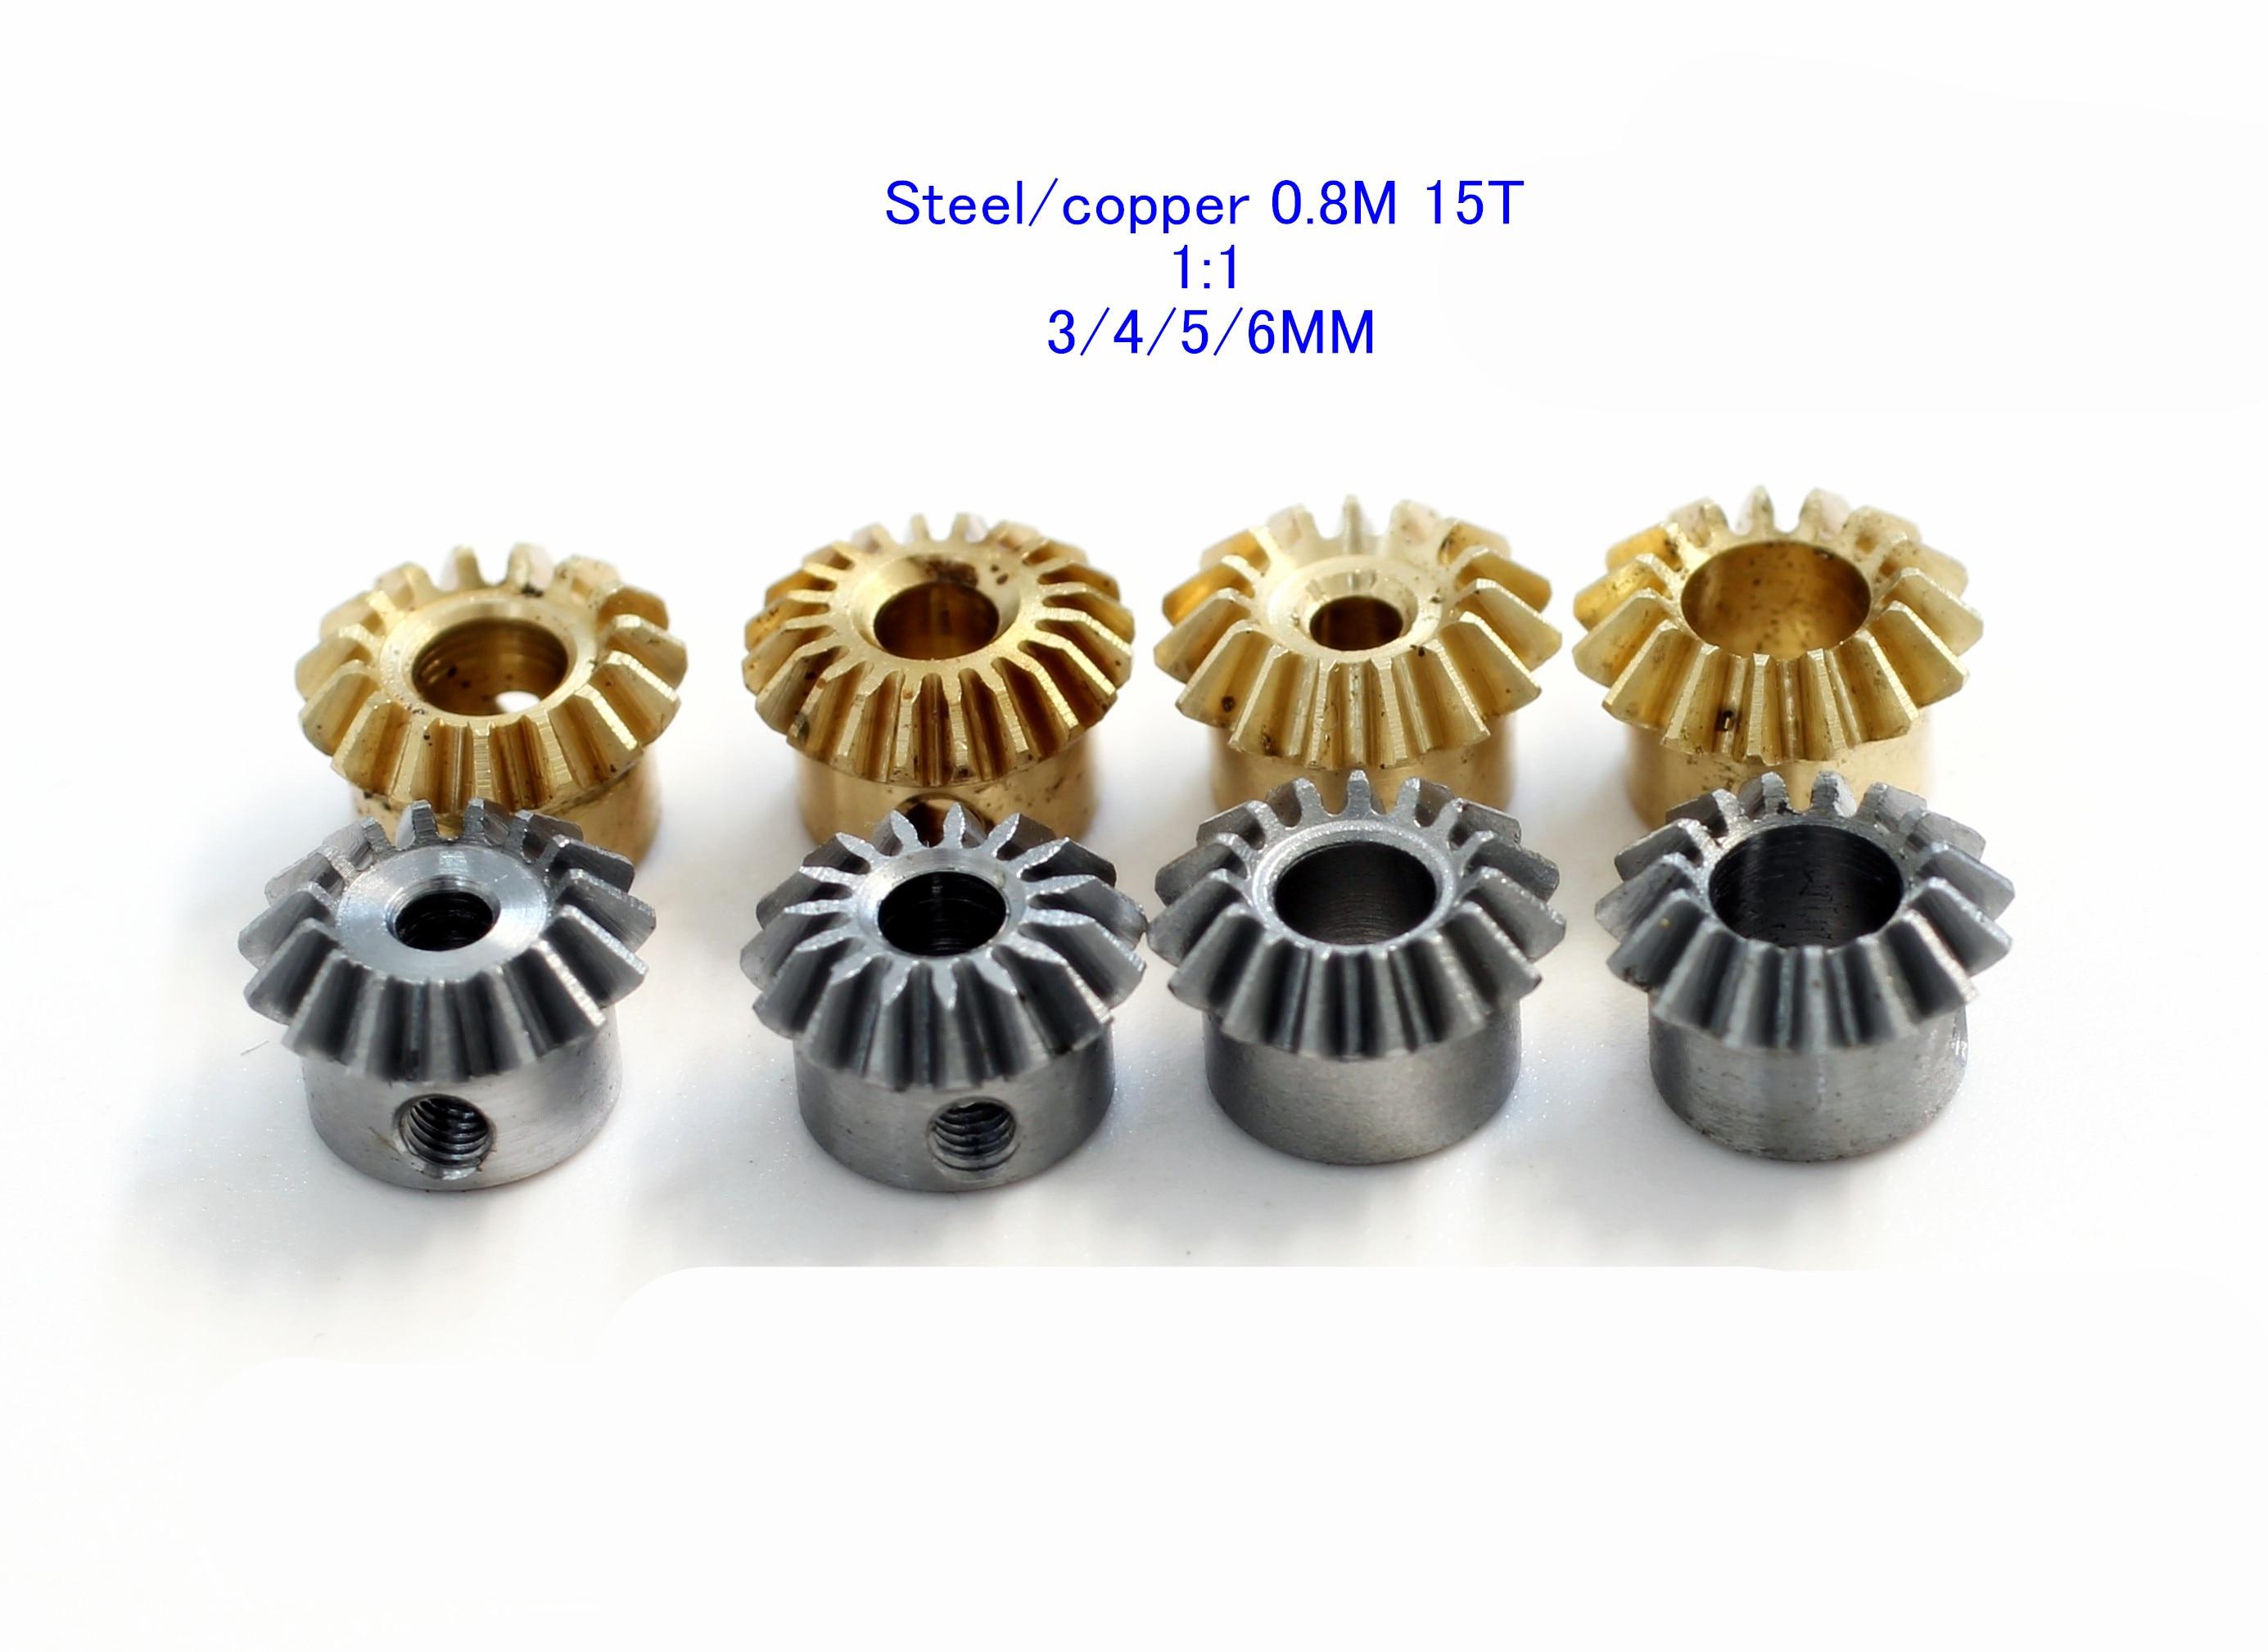 (2 piece) Steel Copper 0.8M 15T 0.8 modulus 15 teeth 1:1 bevel gear Angle gear For 3 4 5 6 mm M3